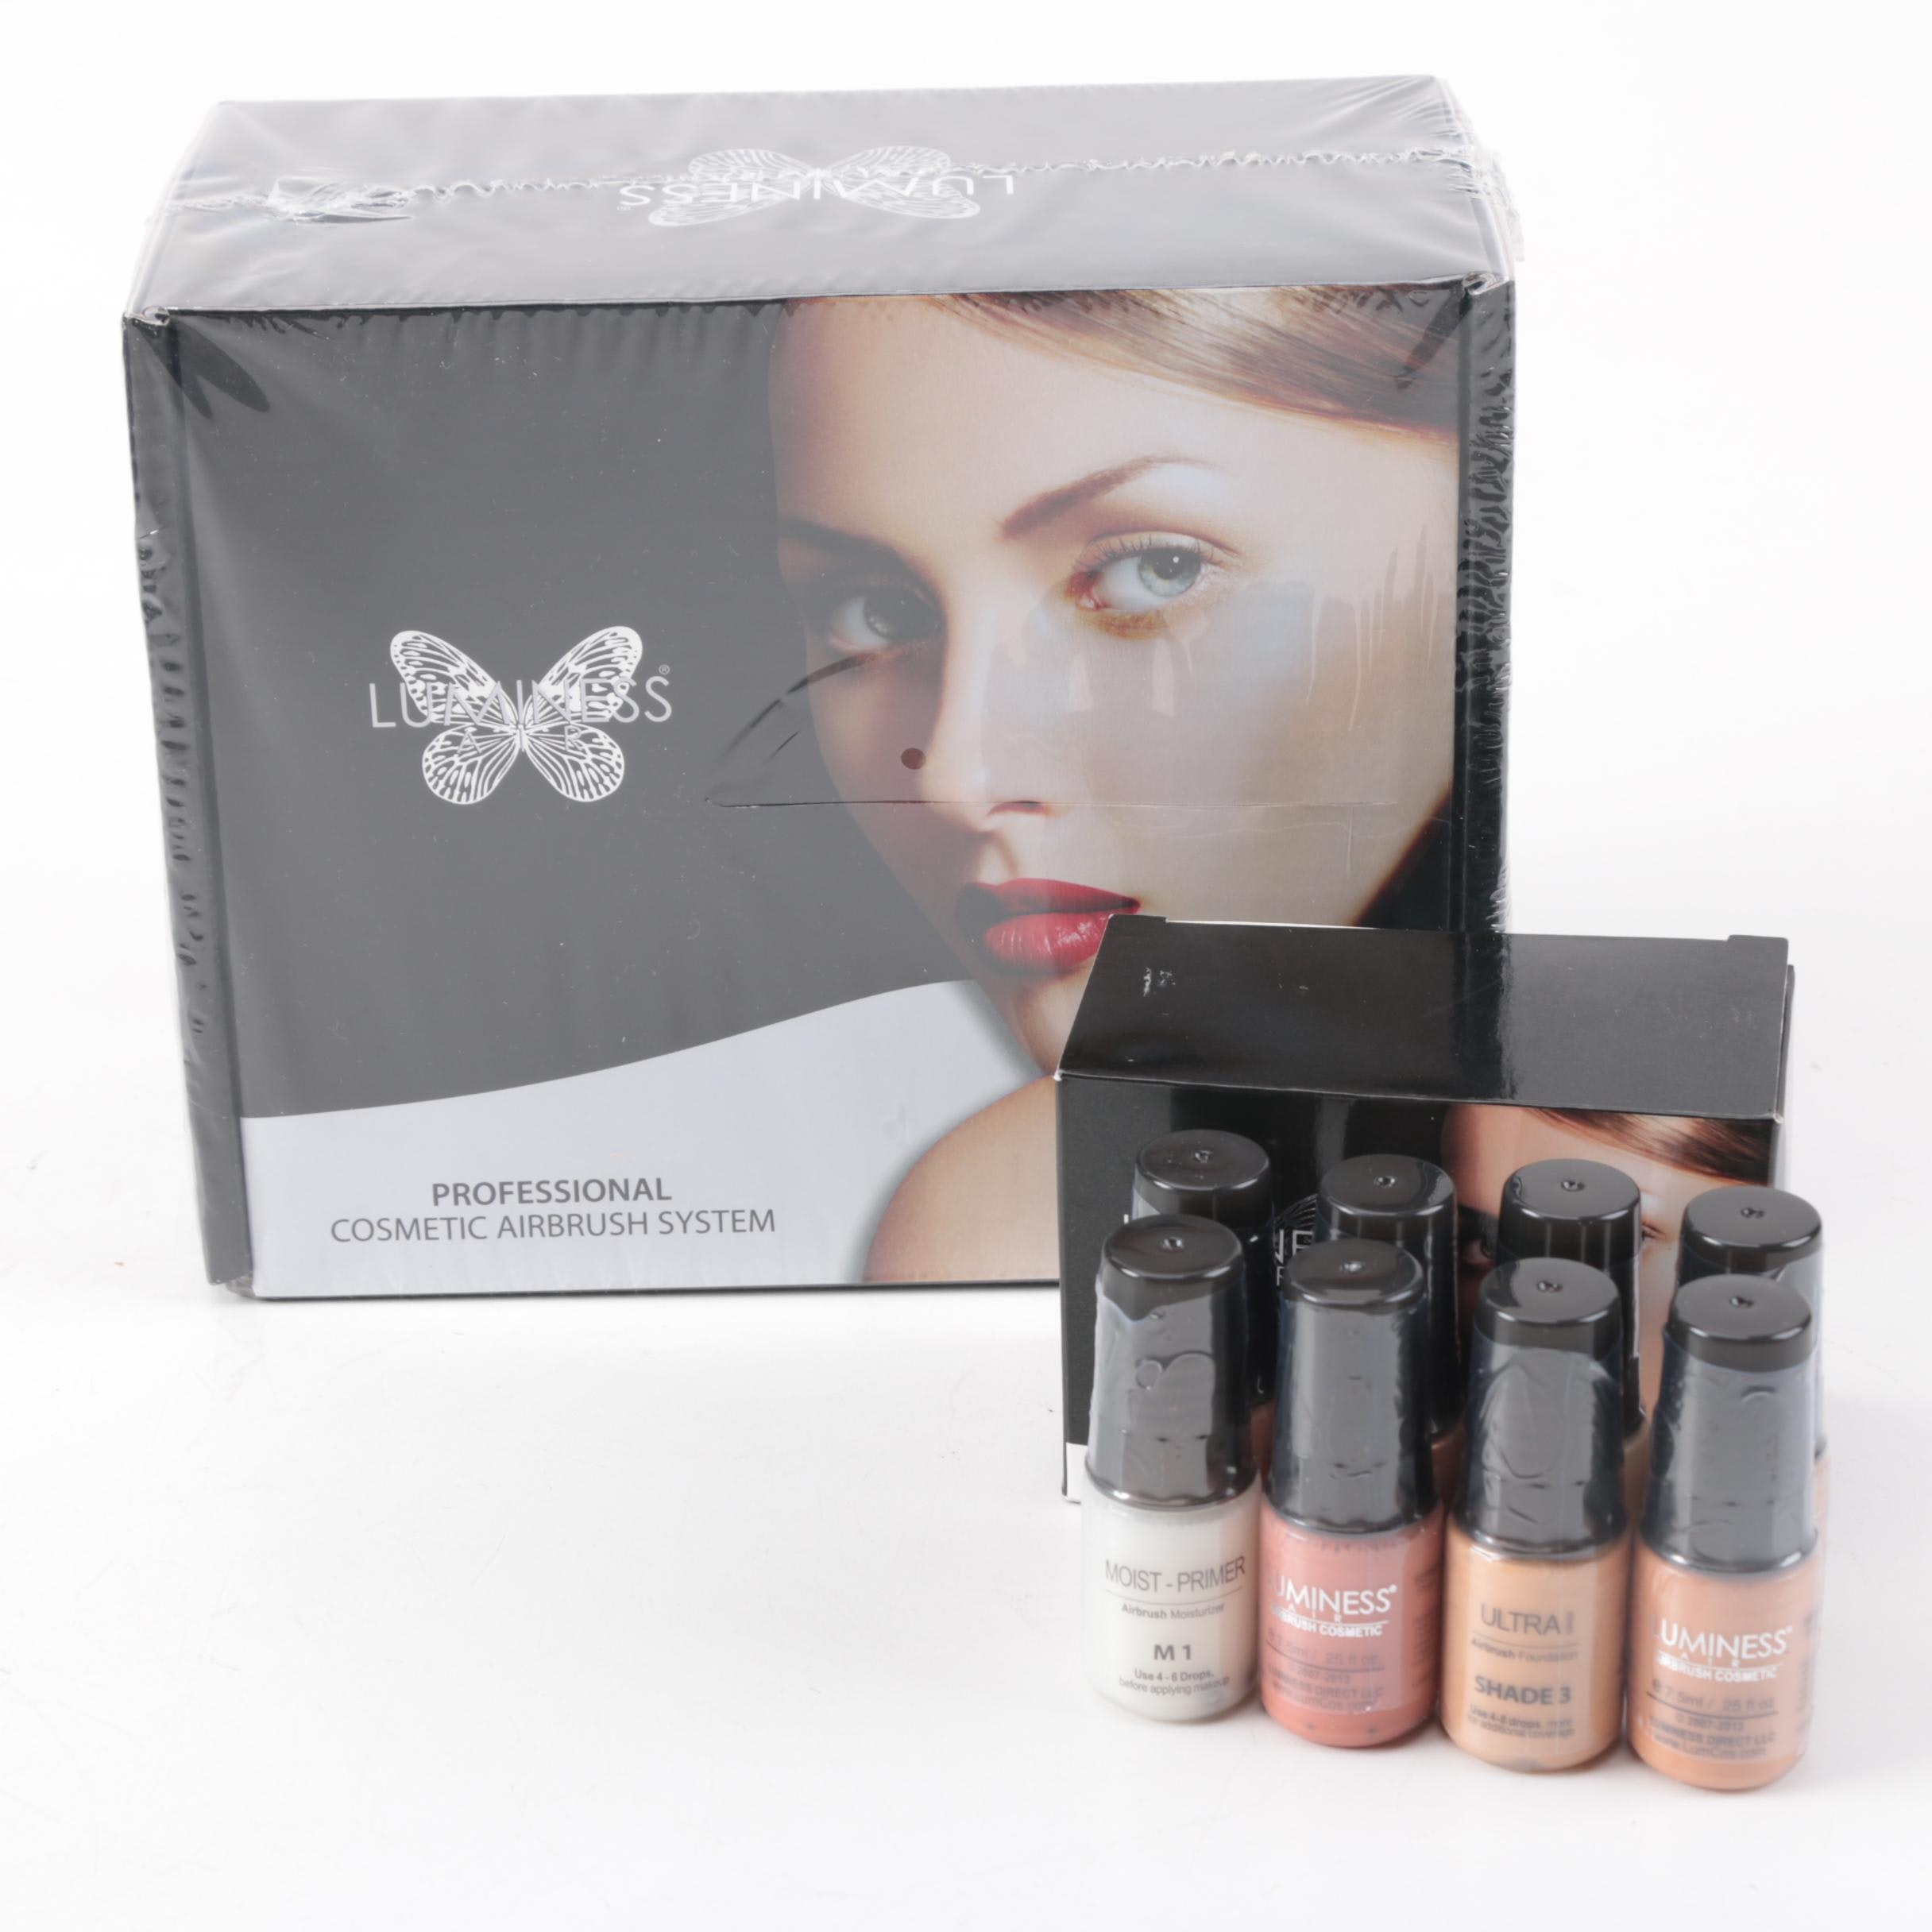 Luminess Air Airbrush Makeup System